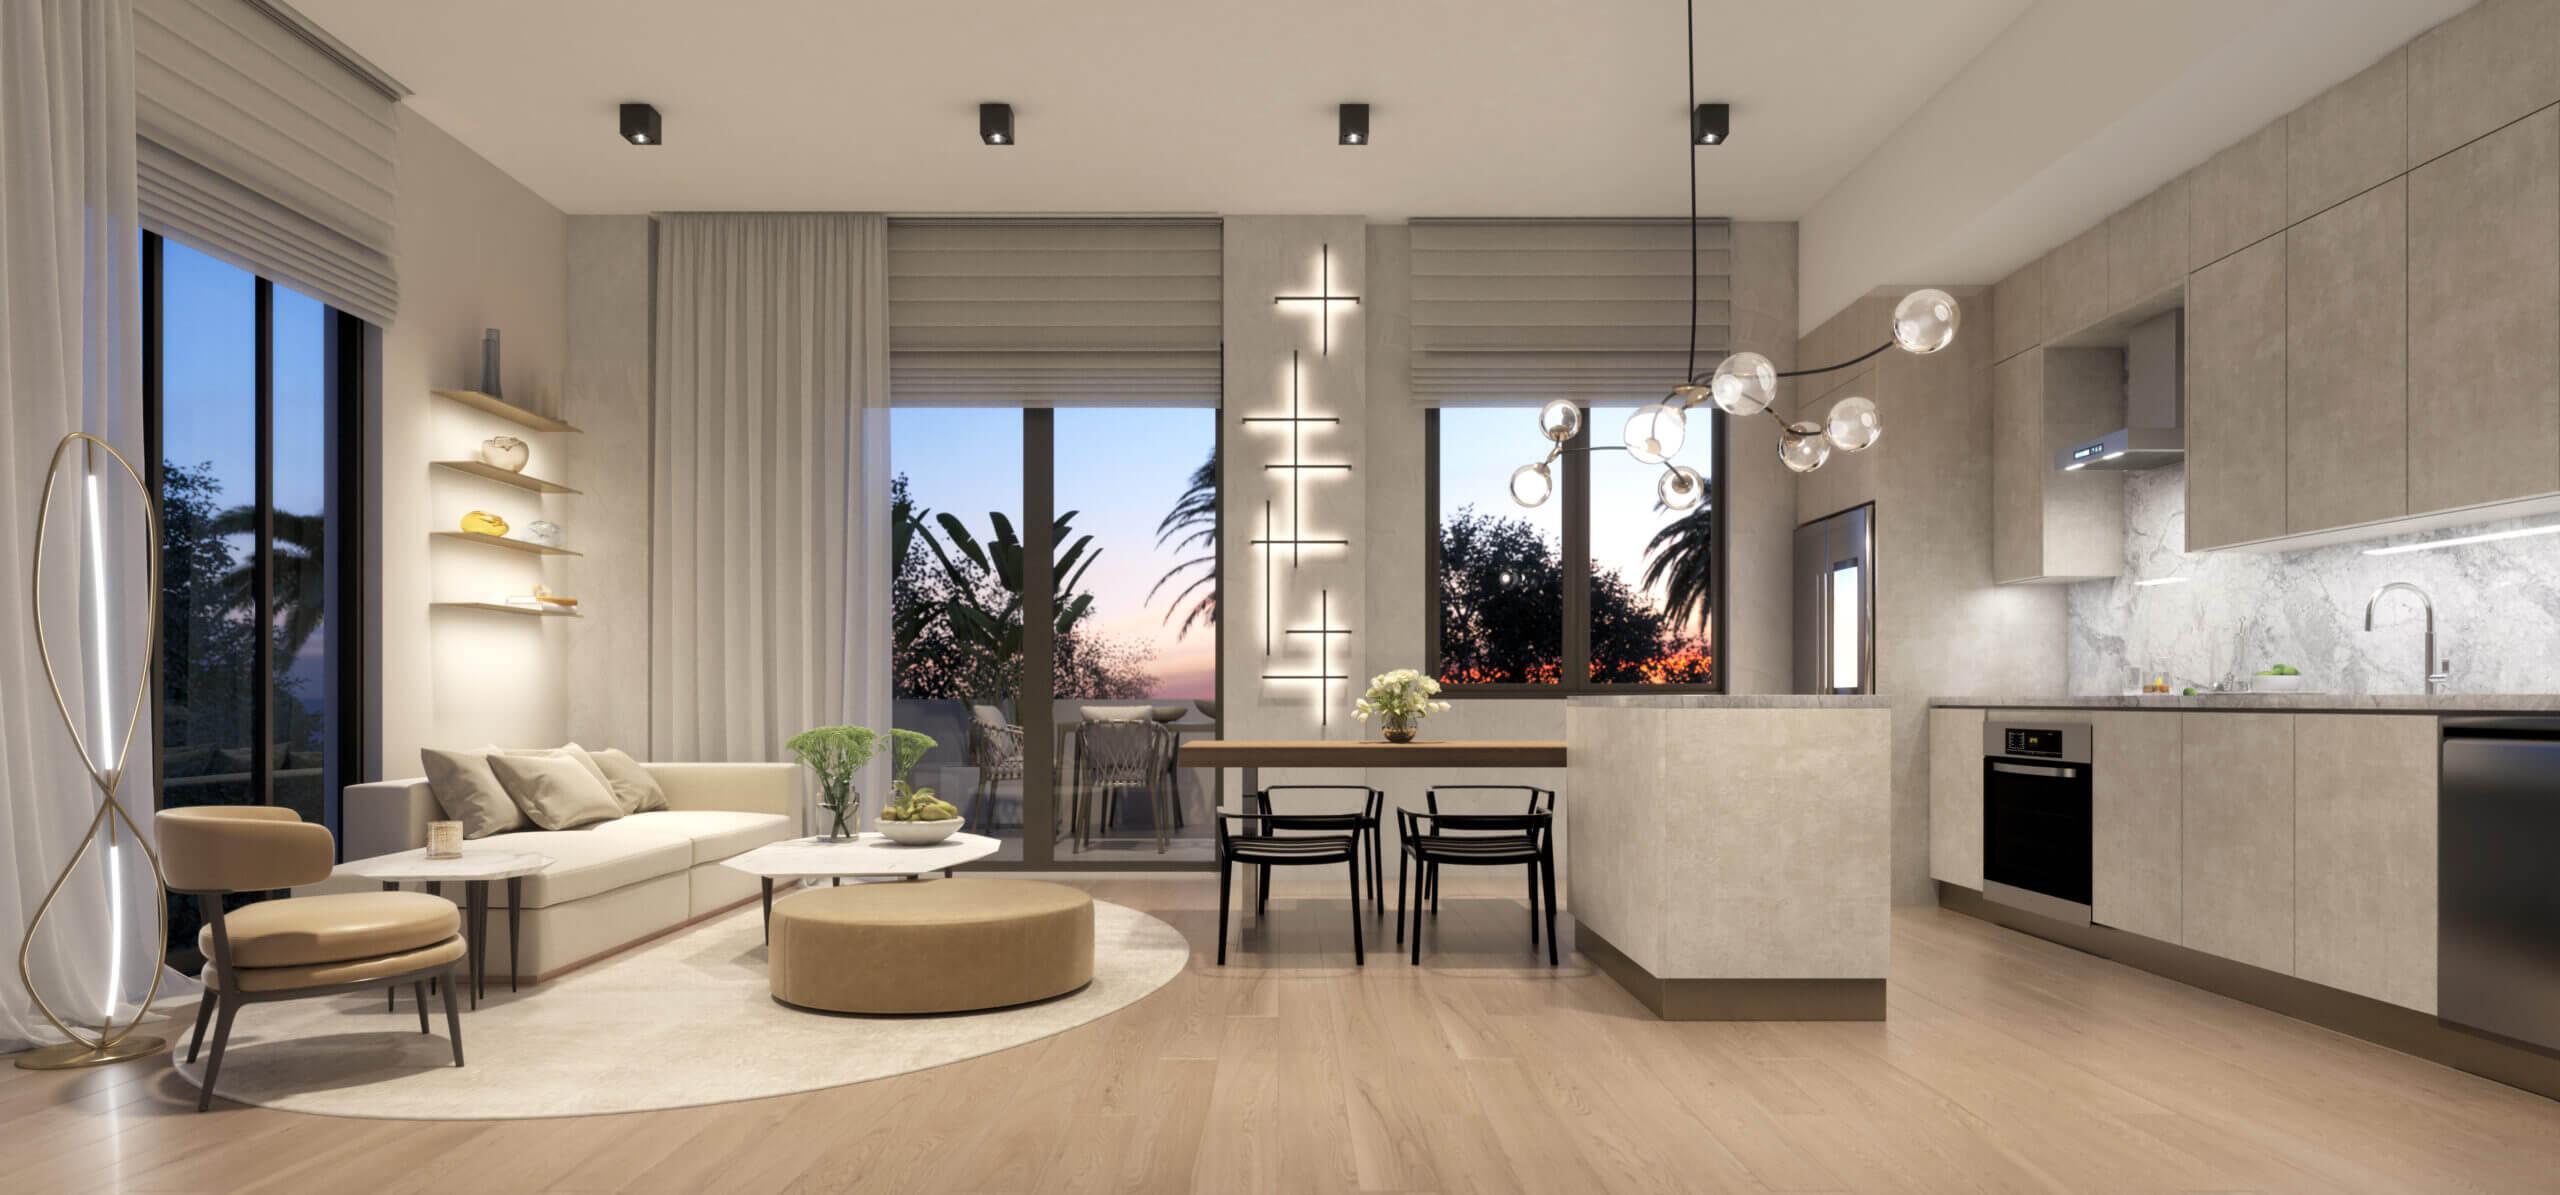 Apartamento A1-A